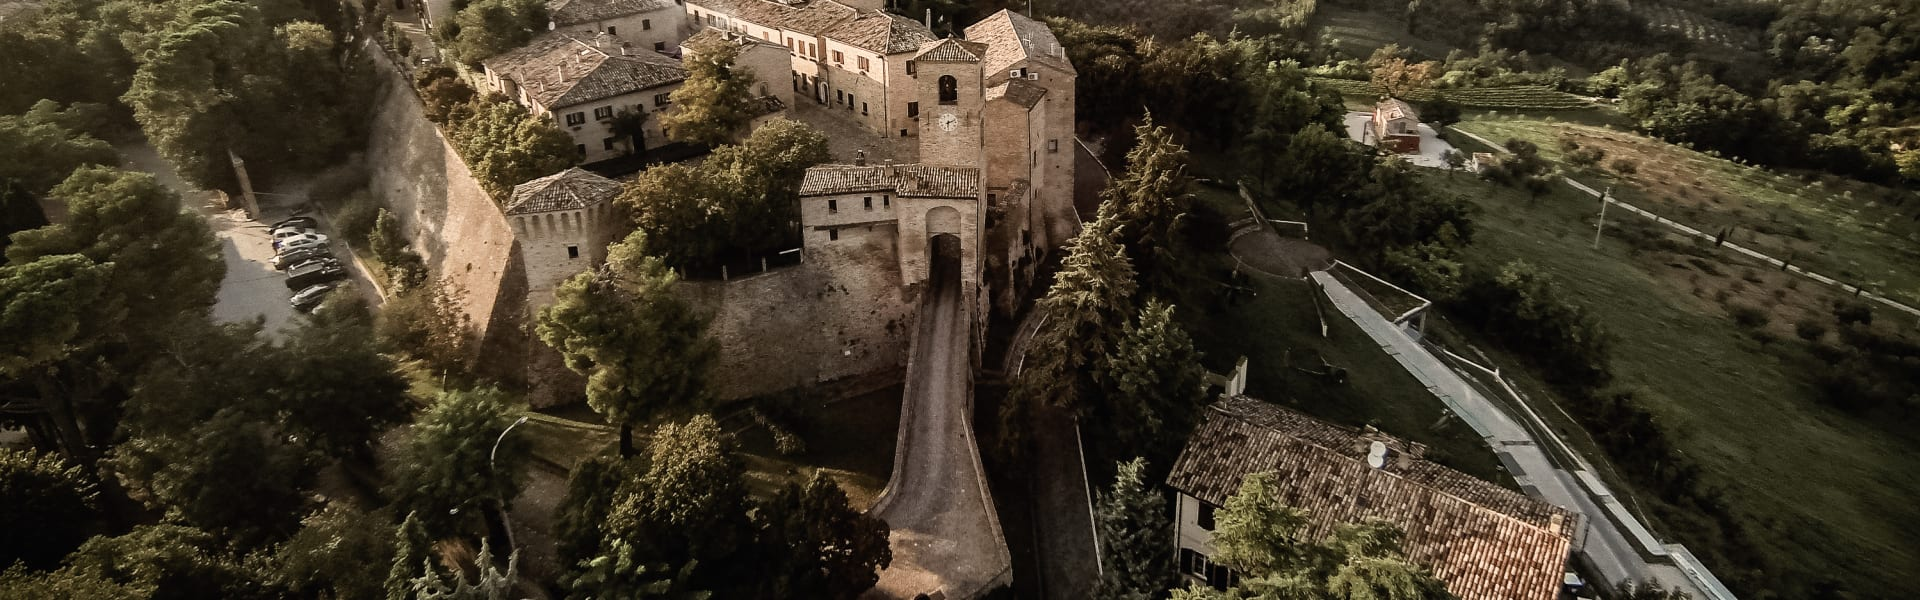 Dormire in un castello: weekend unici in monasteri e ...